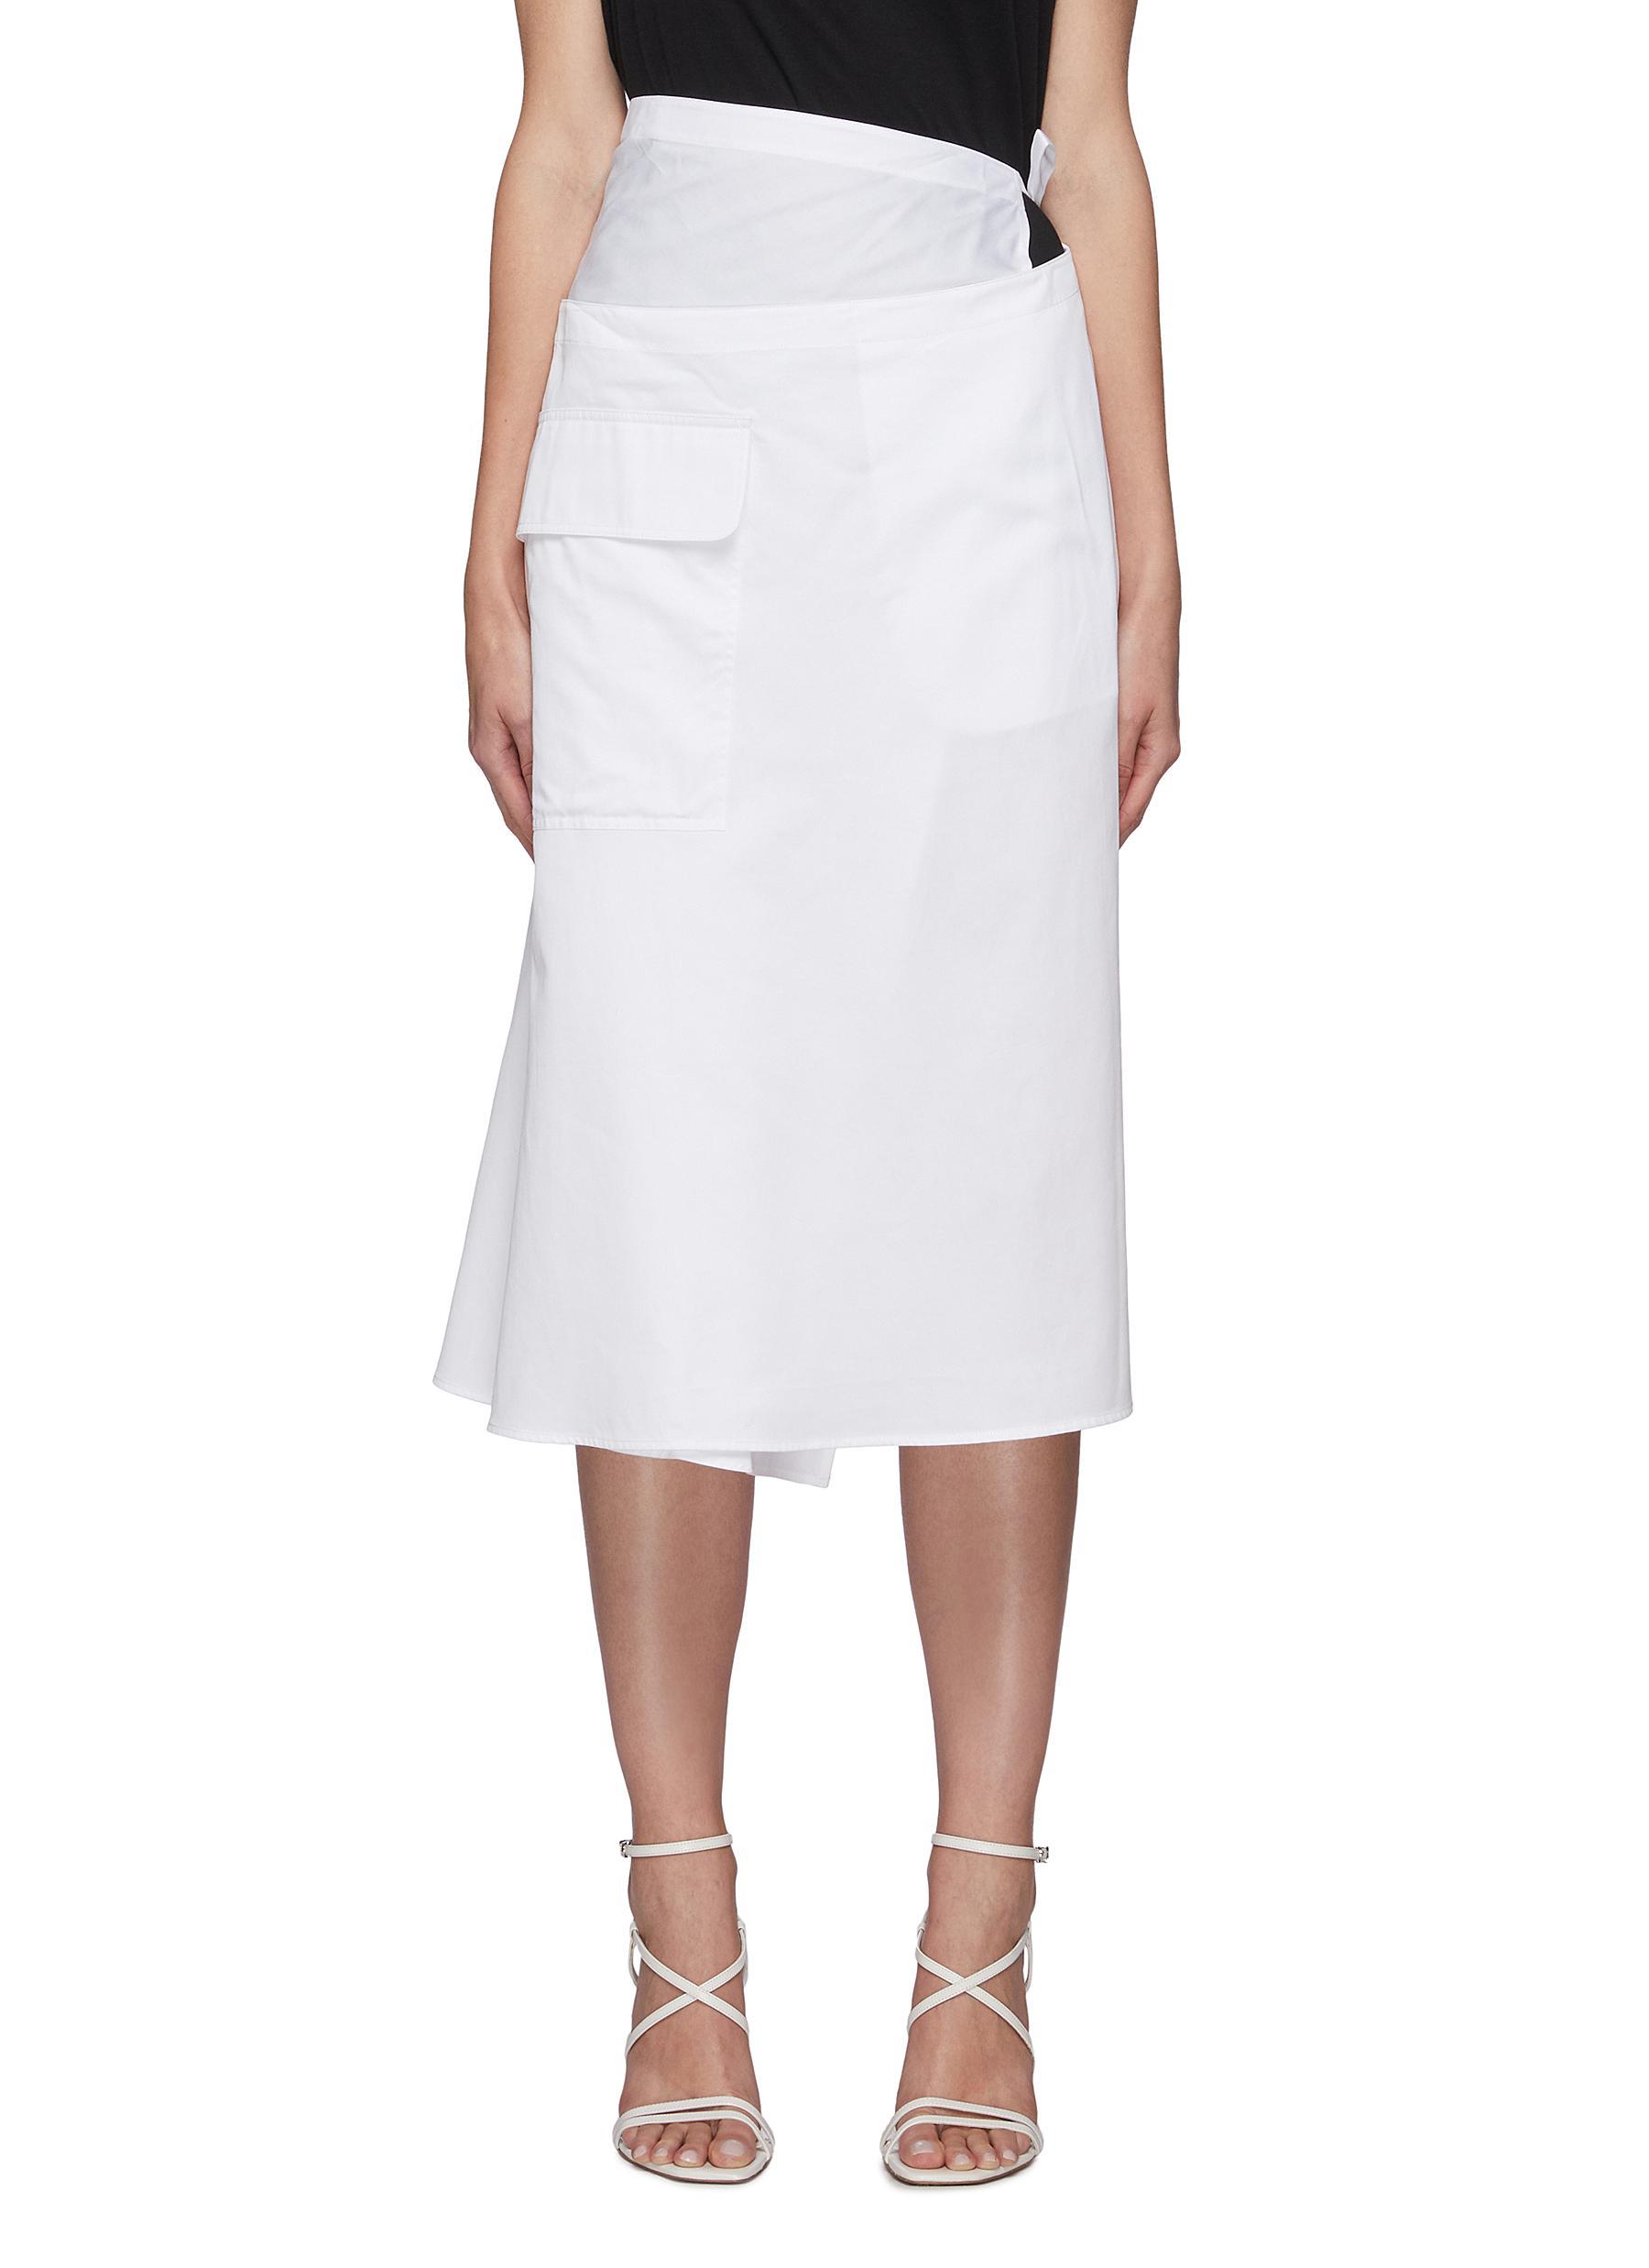 The Leisuresuit Wrap Skirt - TIBI - Modalova